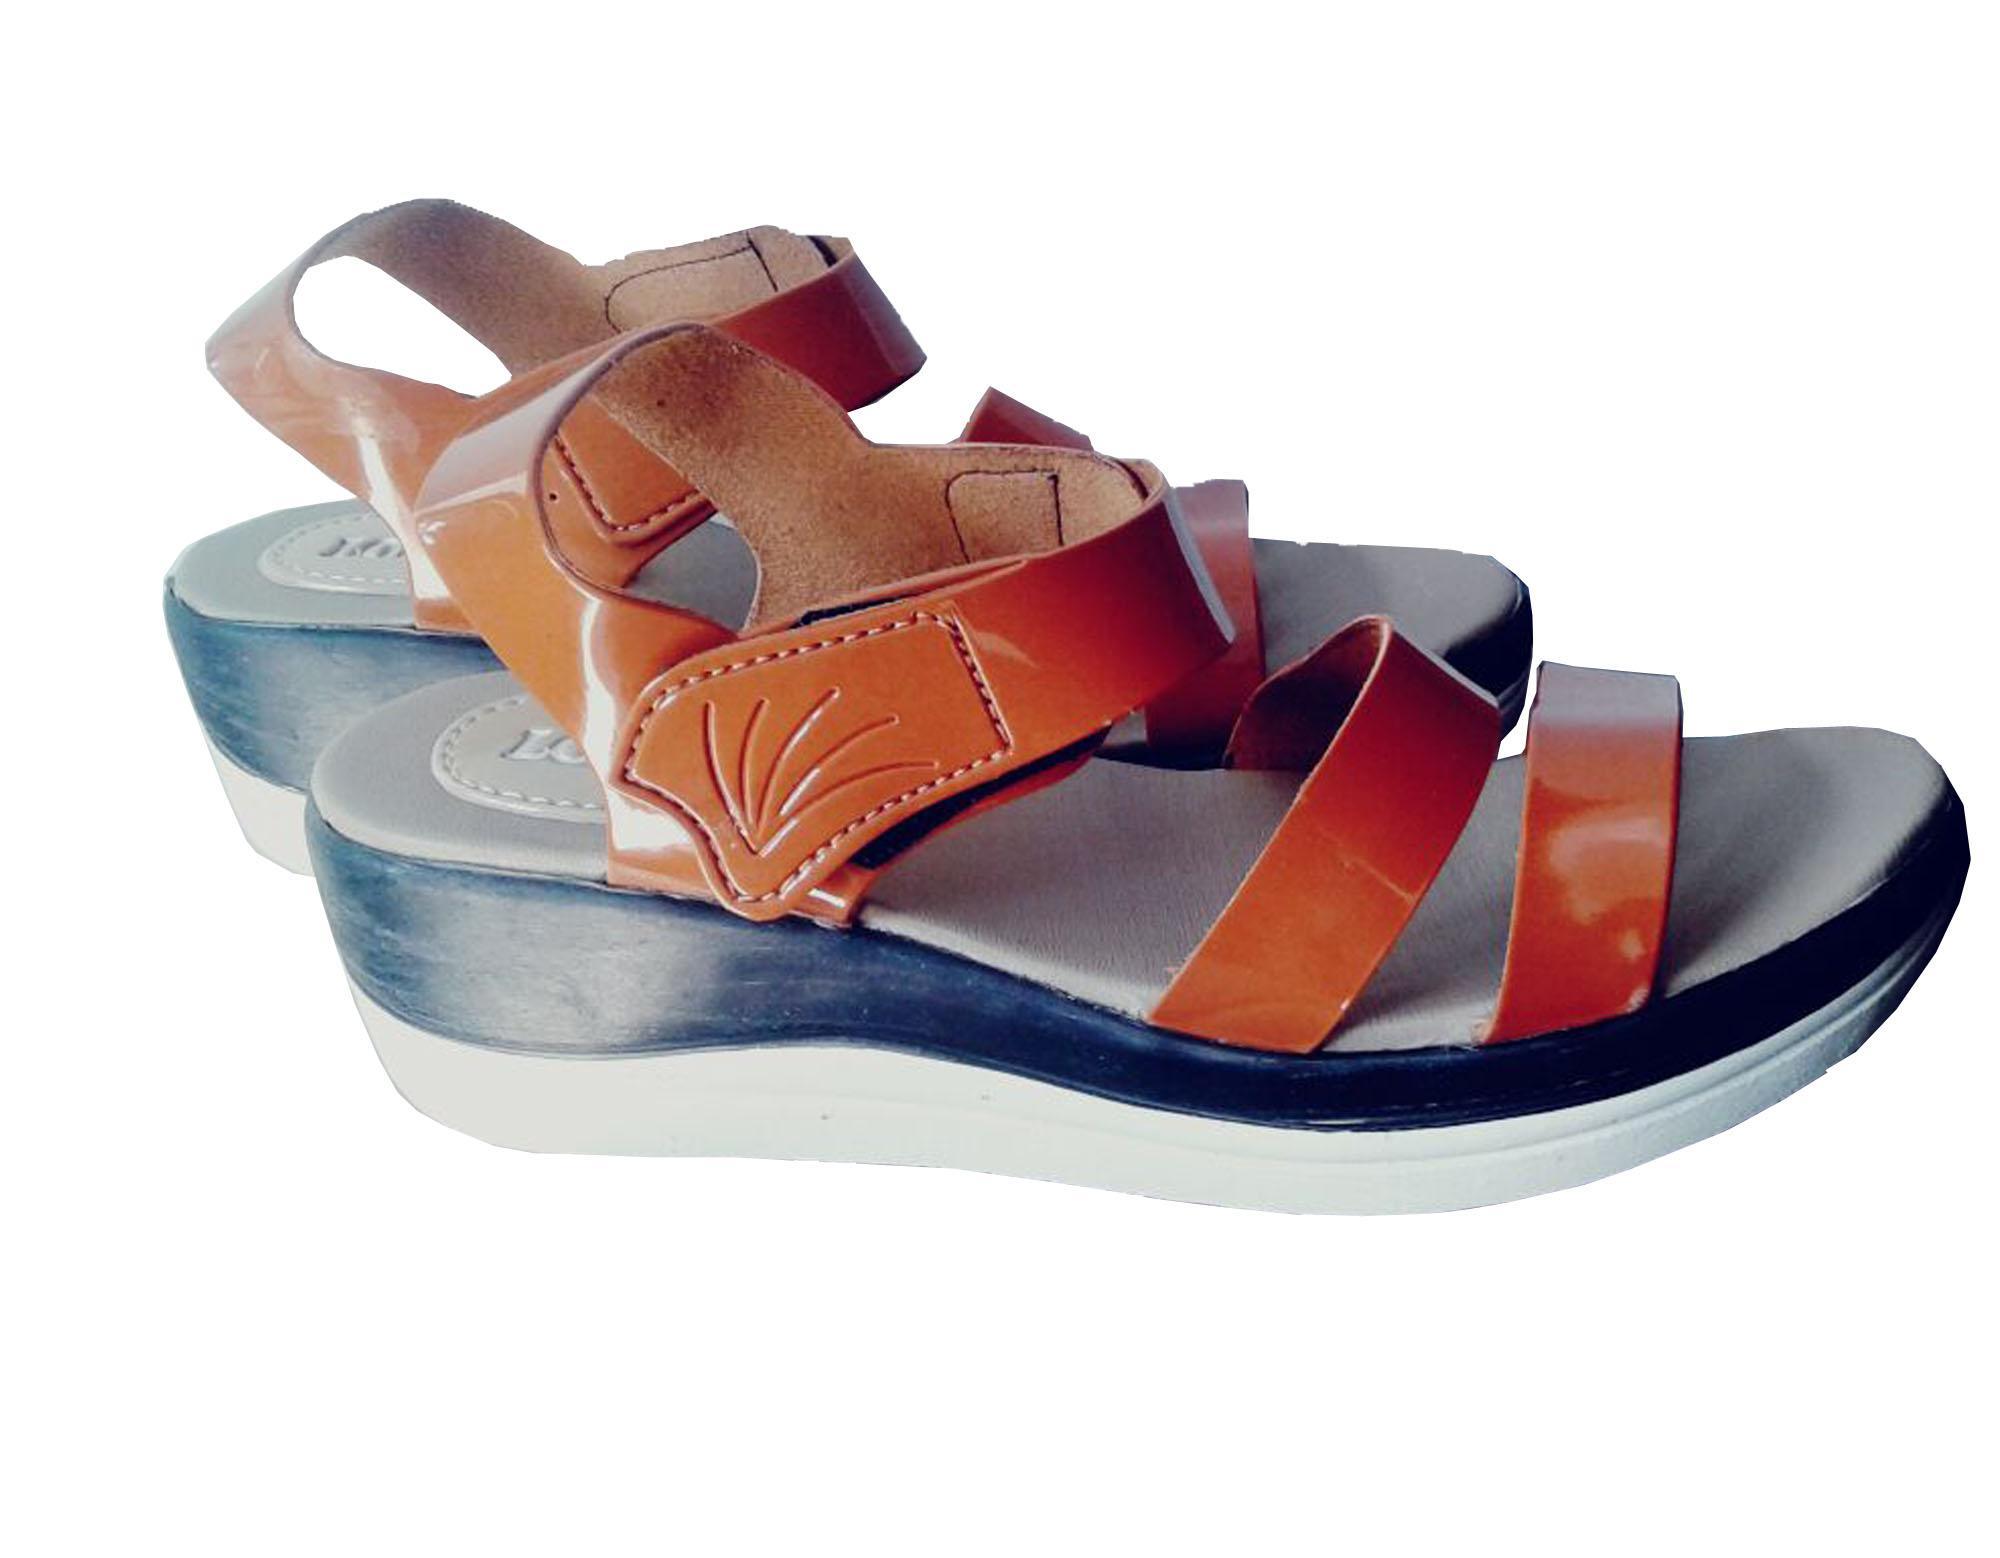 Diky noval/ sandal wanita/ sandal wedges/ sandal kerja/ sandal santai/ sandal